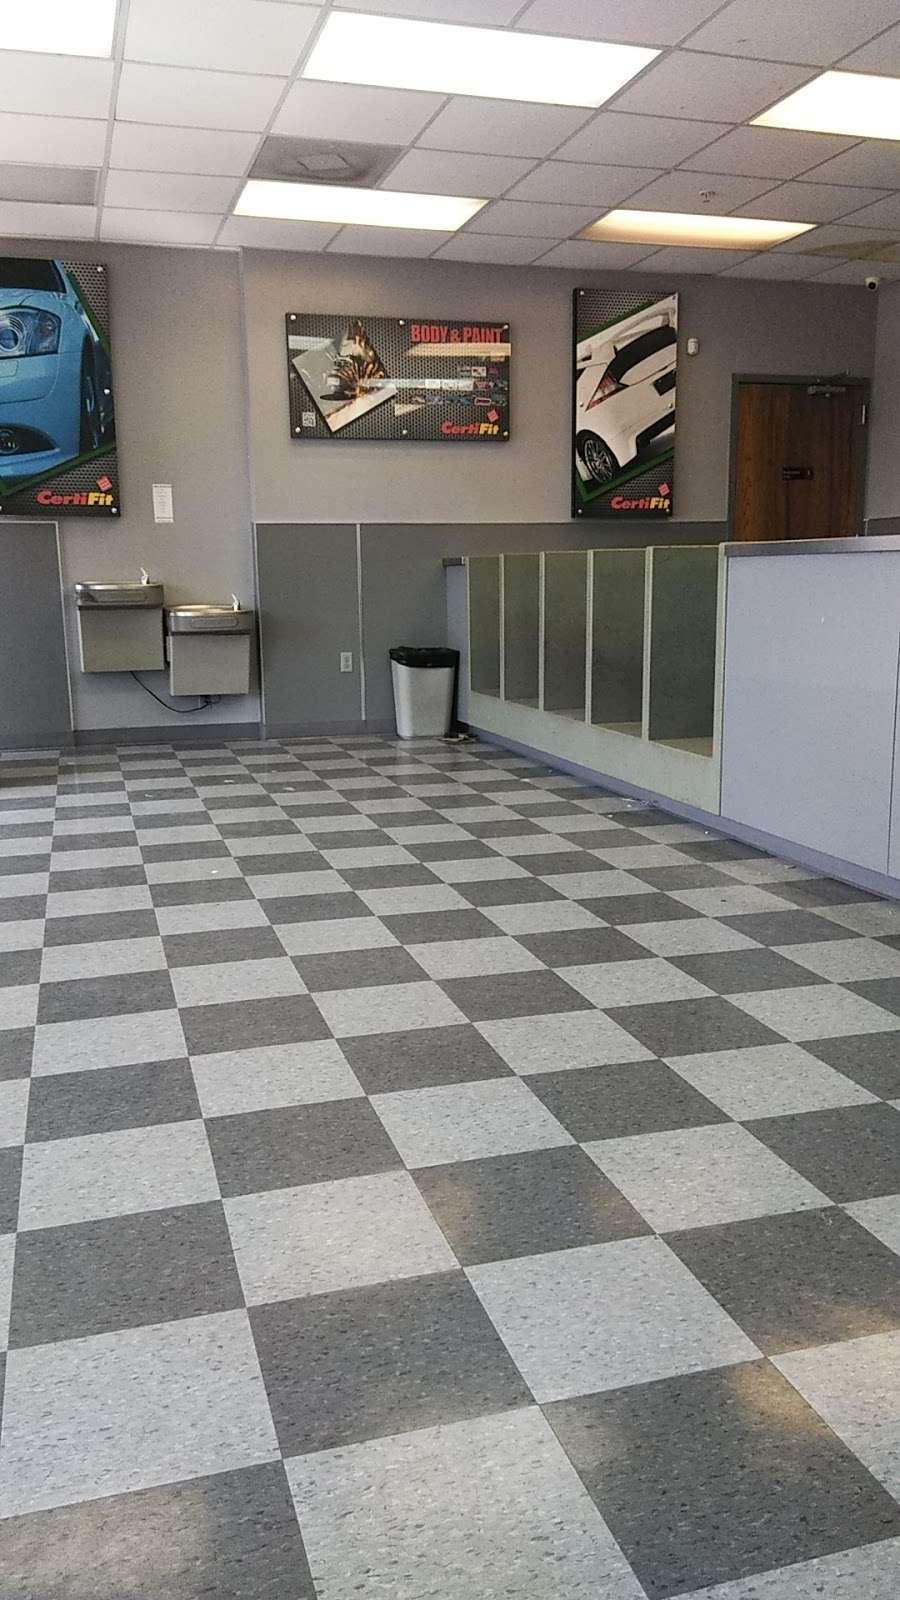 Certifit Auto Body Parts - car repair  | Photo 3 of 10 | Address: 8307 N. Loop East 610, Houston, TX 77029, USA | Phone: (713) 672-2100